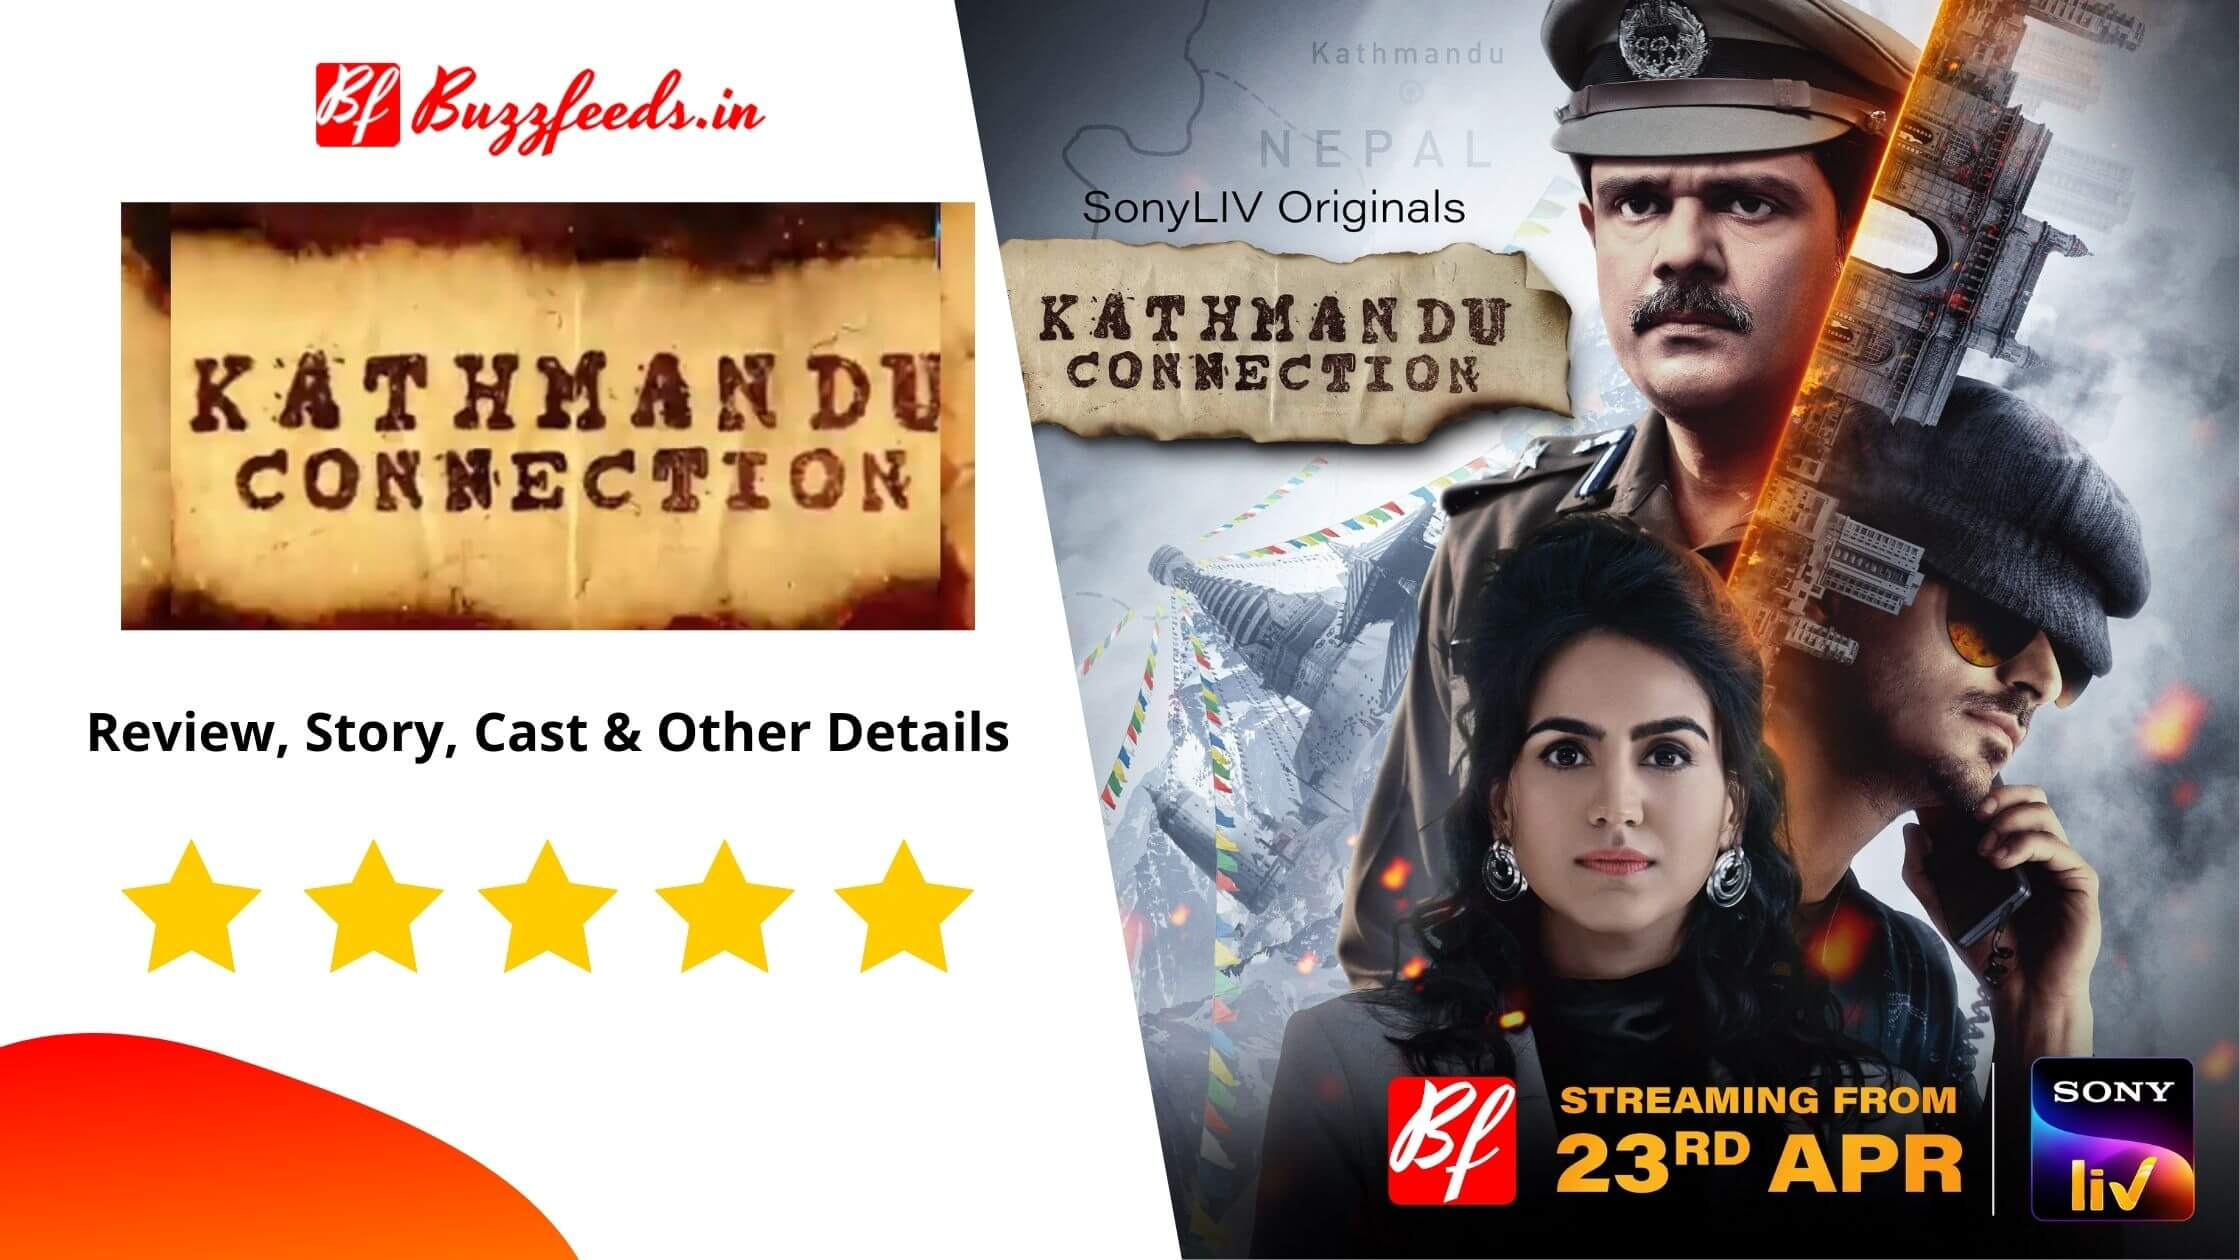 Kathmandu Connection Review, Story, Cast & Other Details